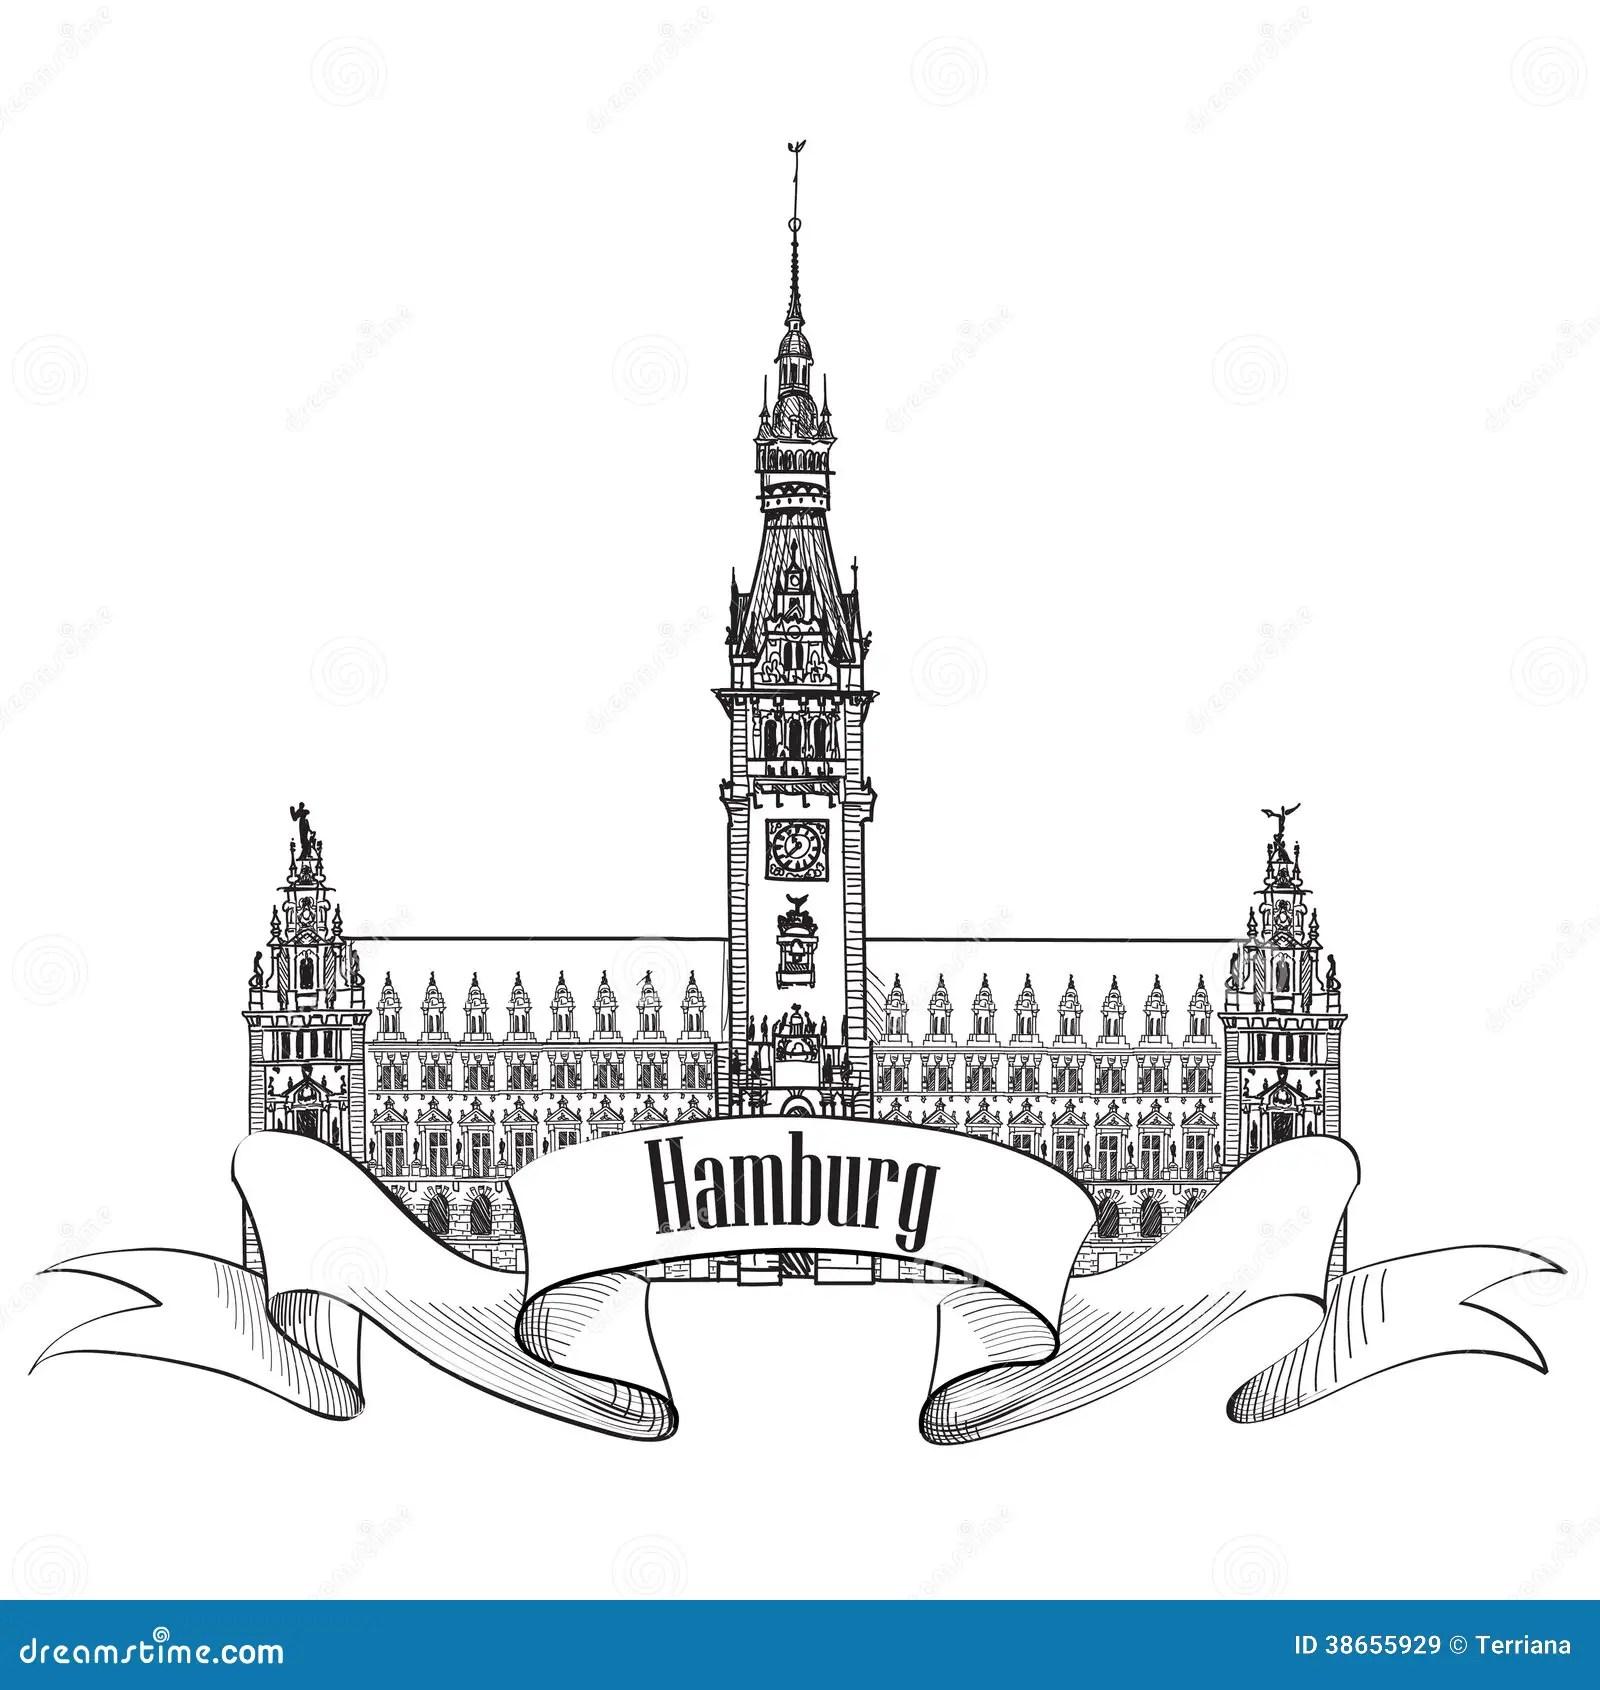 Hamburg Landmark Germany Germany Sketch Symbol Royalty Free Stock Images